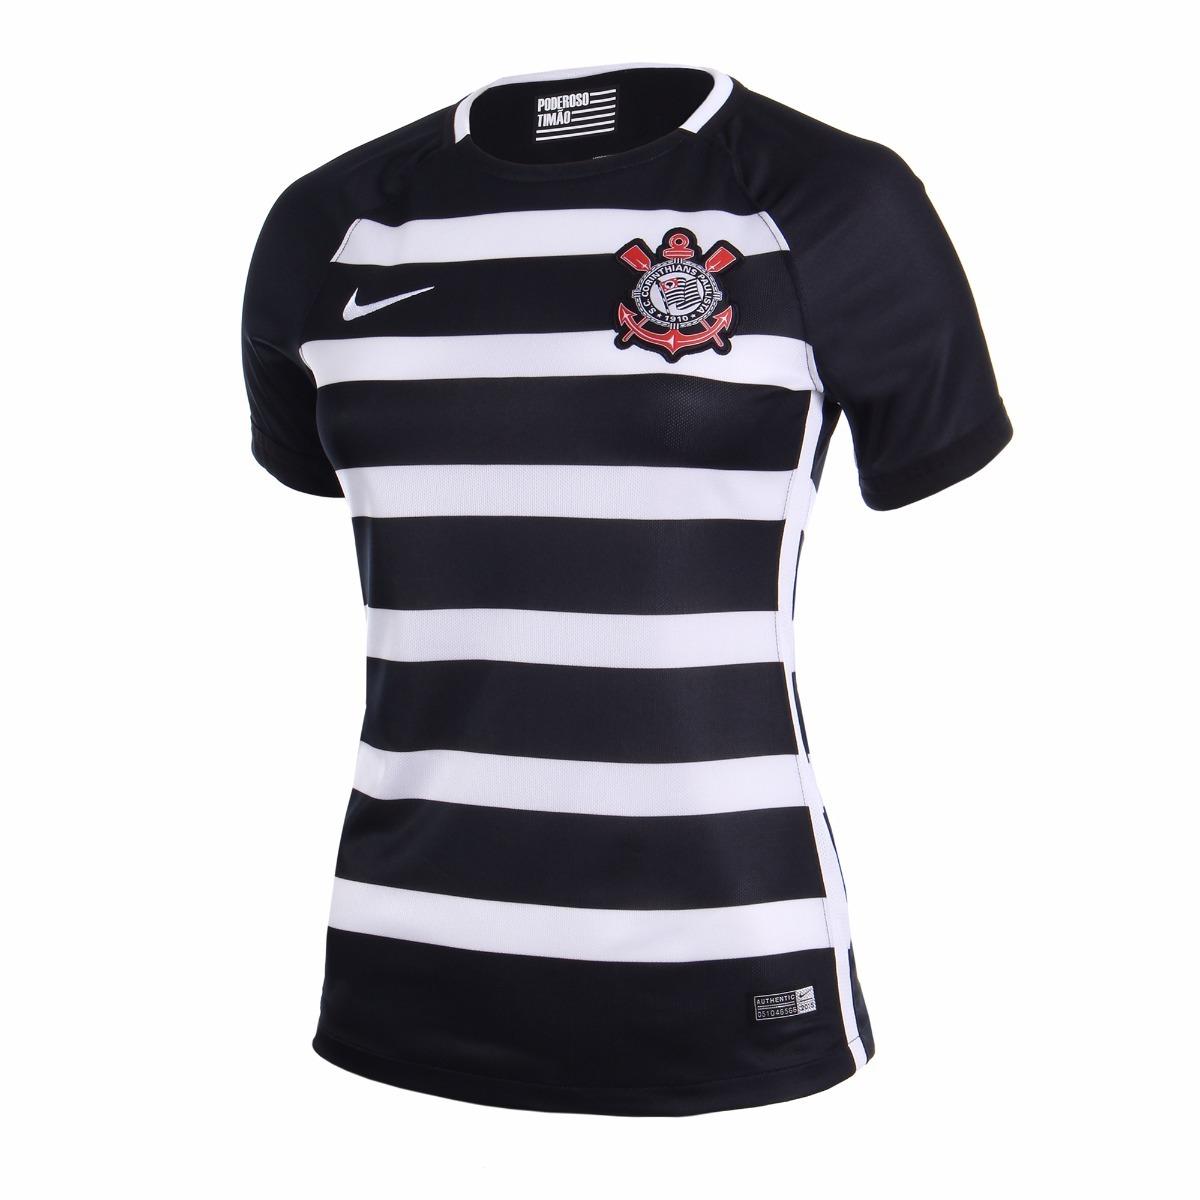 camisa nike corinthians ii torcedor 2015 2016 - feminina. Carregando zoom. 33527a7886a29